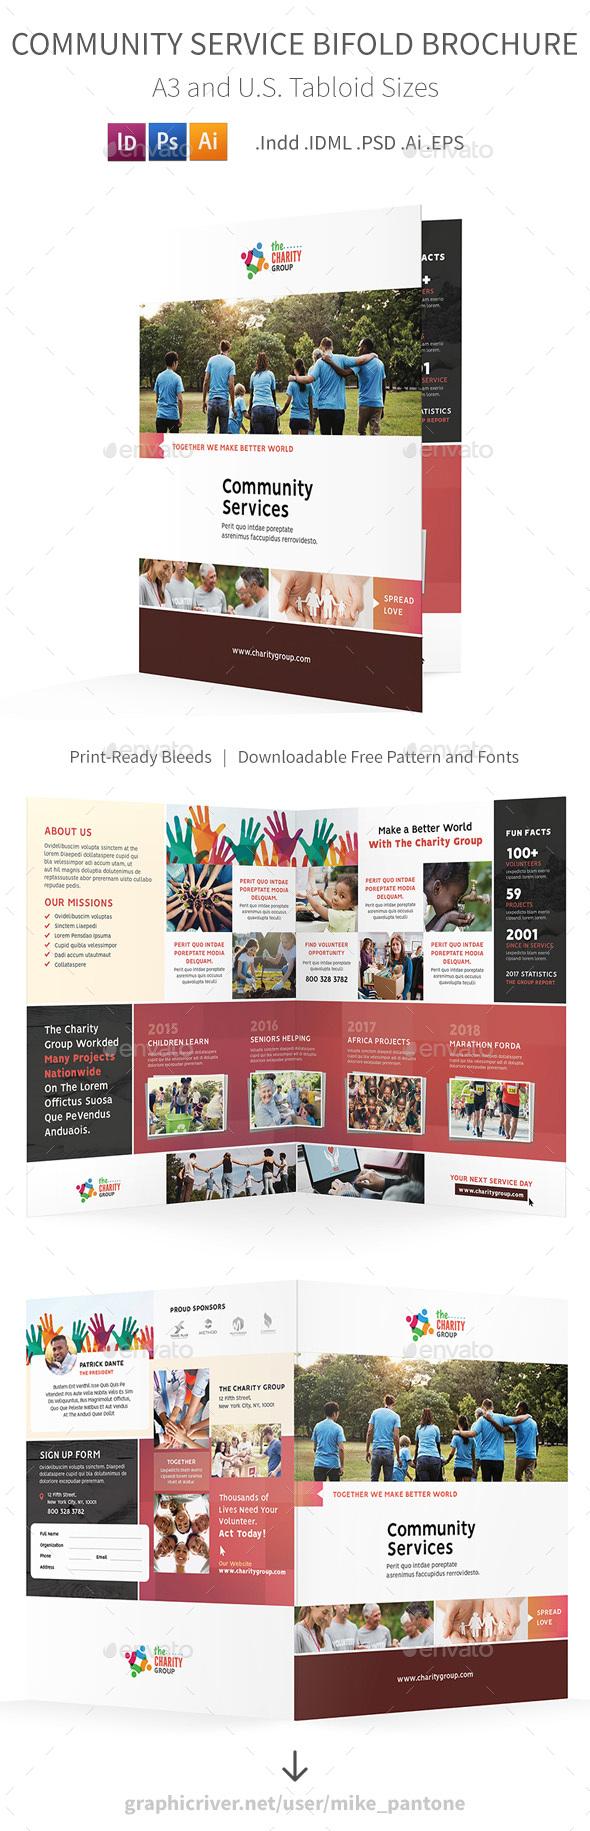 GraphicRiver Community Service Bifold Halffold Brochure 2 21123252